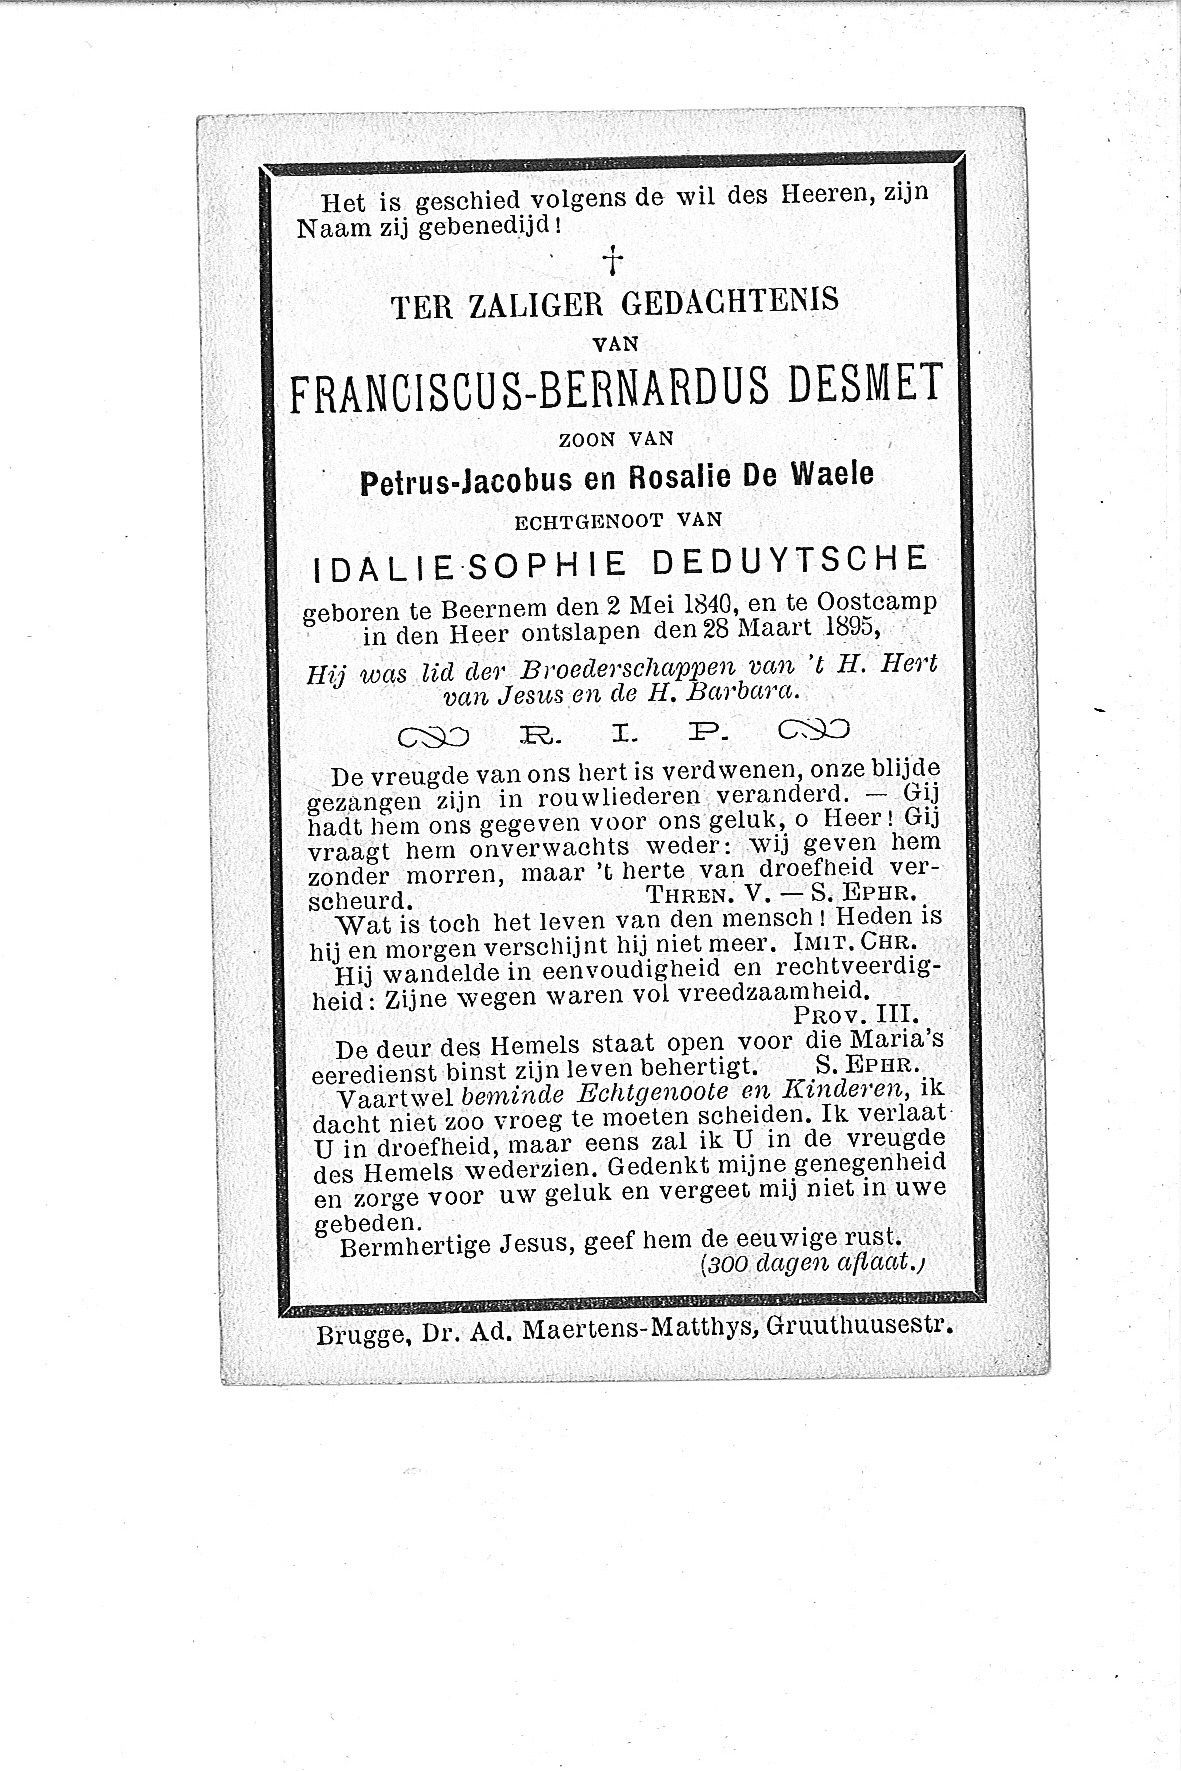 Franciscus-Bernardus (1895) 20091016144105_00002.jpg